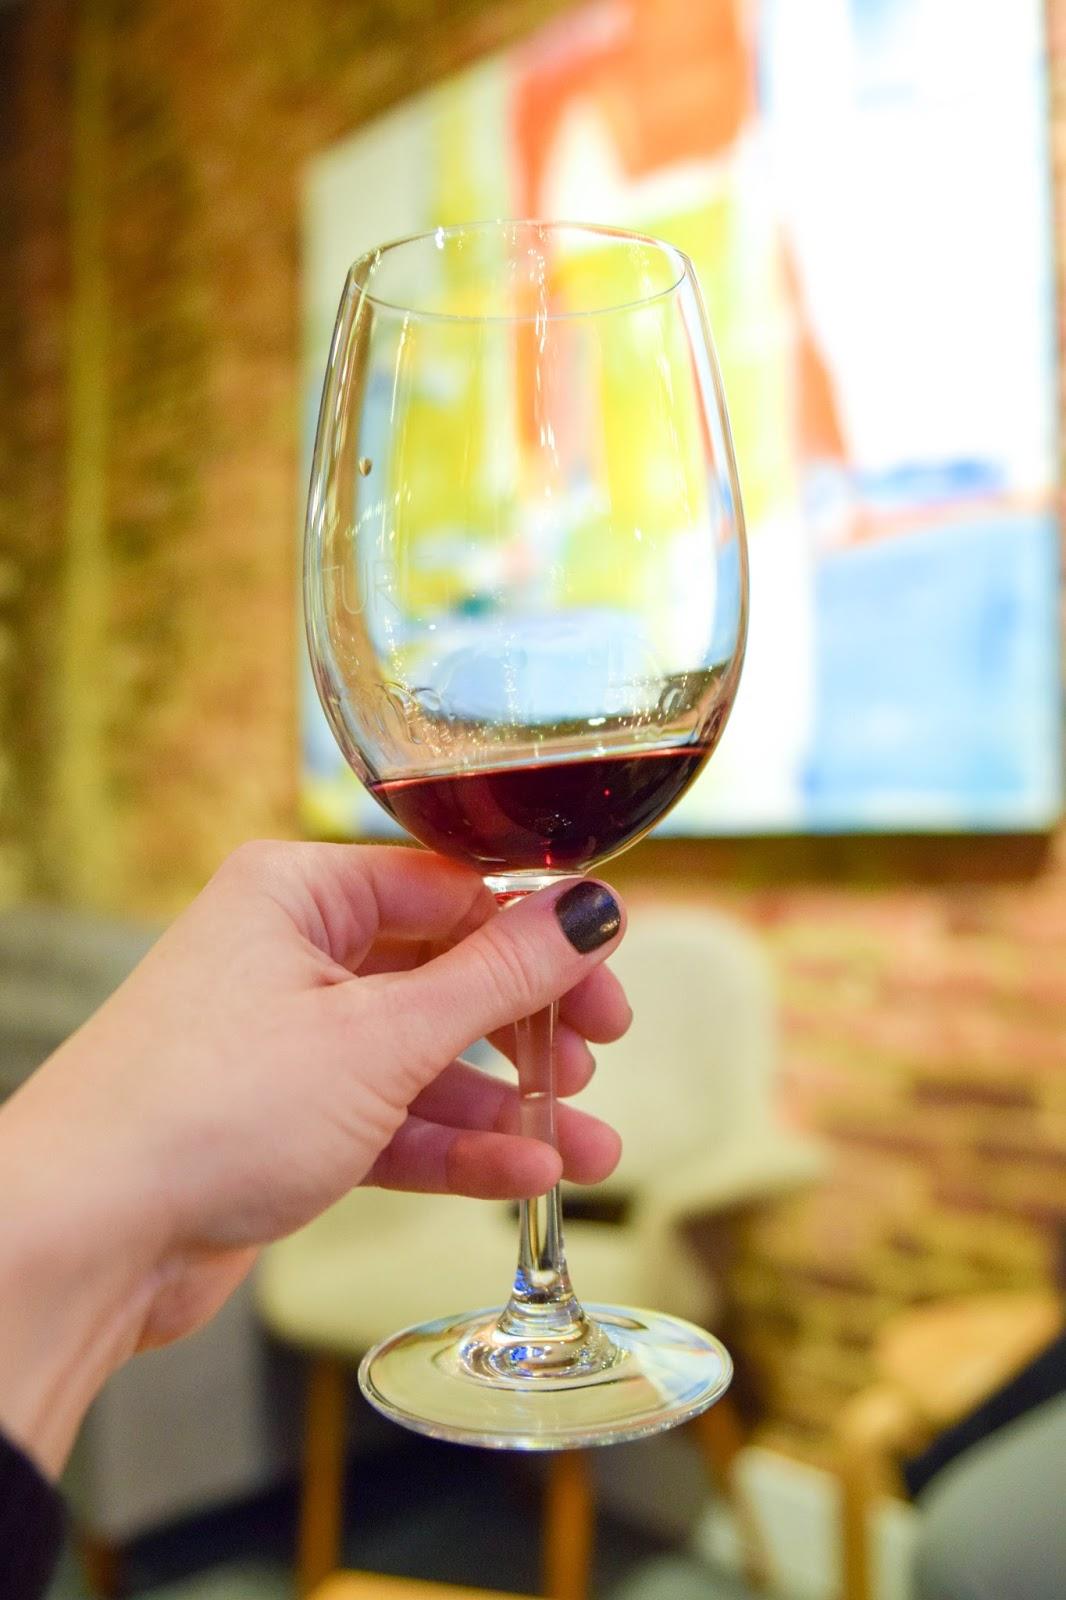 frederick maryland travel guide - visit frederick - frederick maryland viniculture - romantic frederick maryland - frederick maryland wine